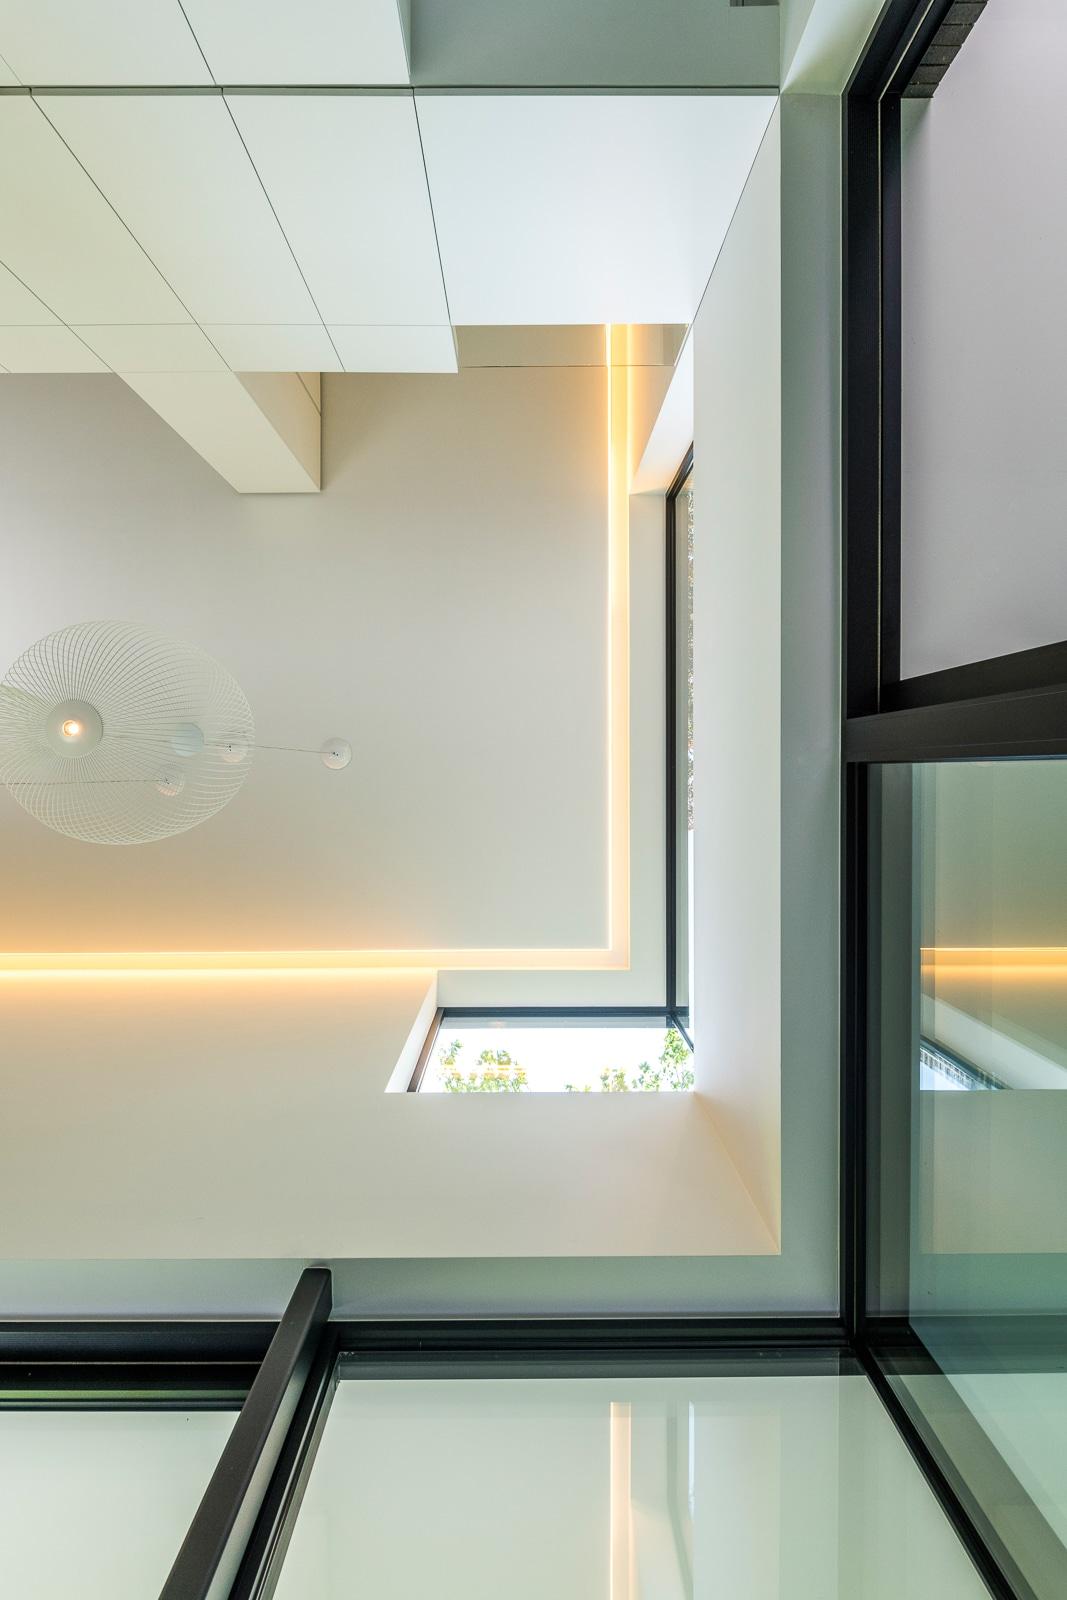 BaeyensBeck Kjell 032web | Baeyens & Beck architecten Gent | architect nieuwbouw renovatie interieur | high end | architectenbureau